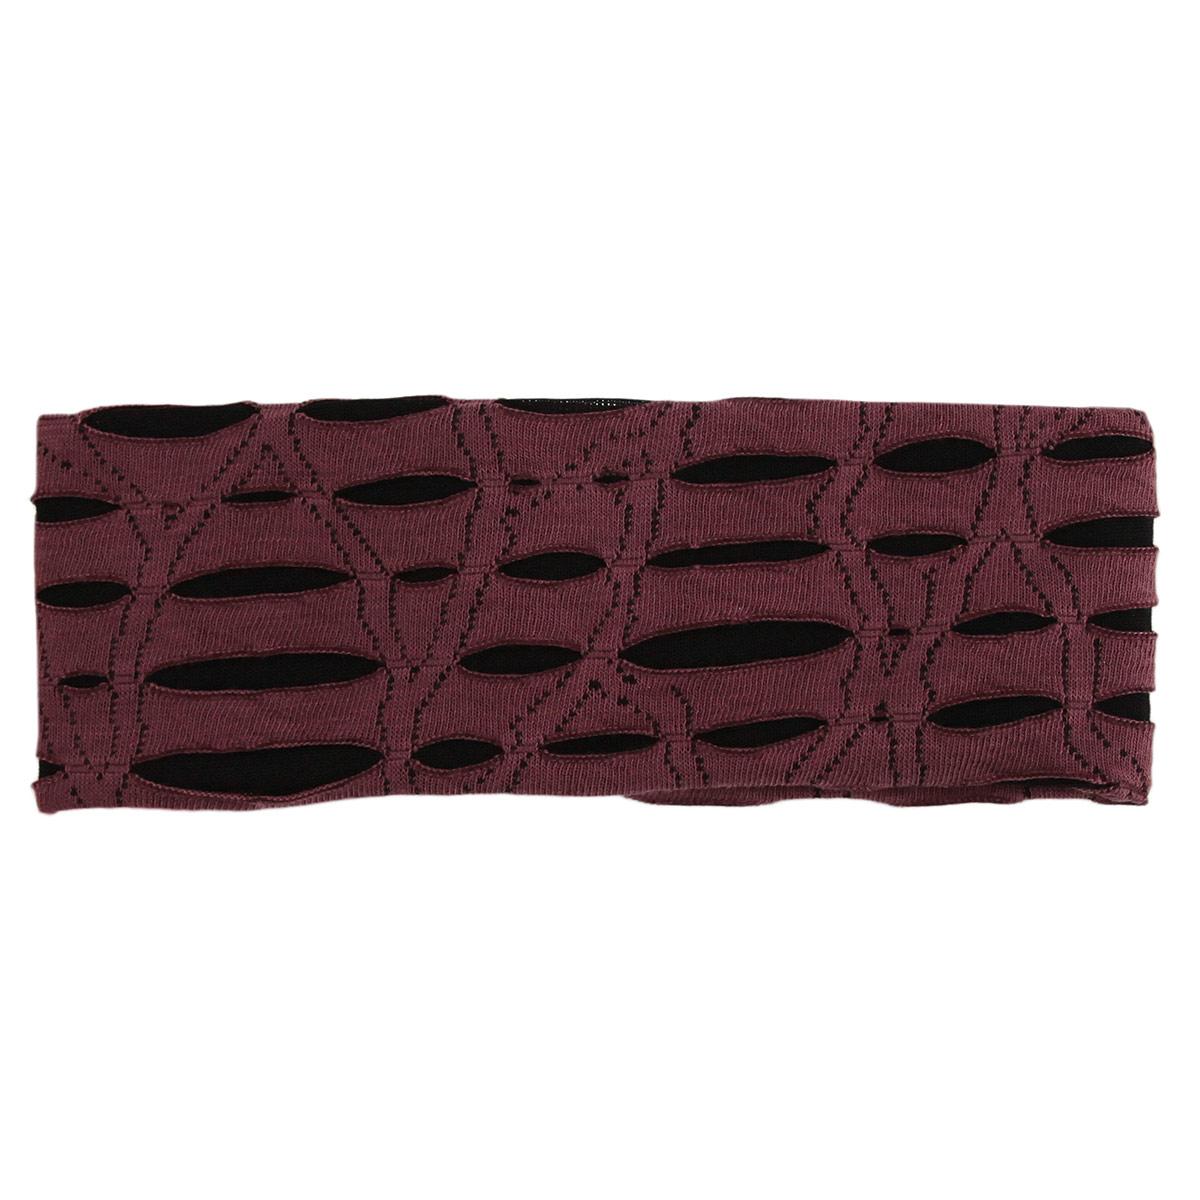 "Повязка для волос ""Fashion House"", цвет: бордовый. FH28008"